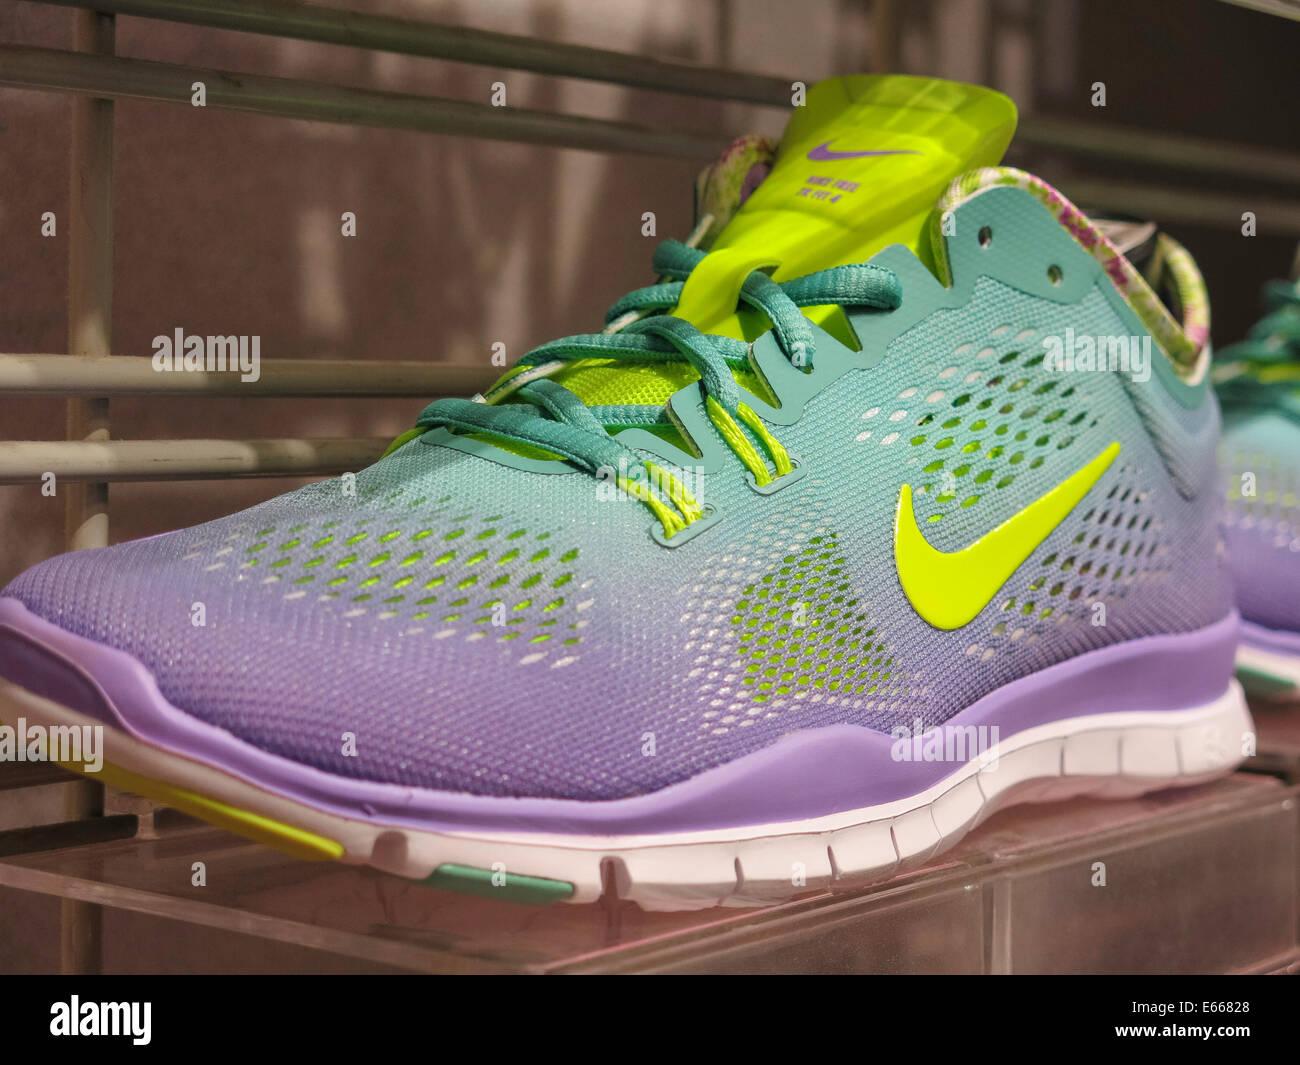 de949bf7462f1a Nike Shoe Stock Photos   Nike Shoe Stock Images - Alamy